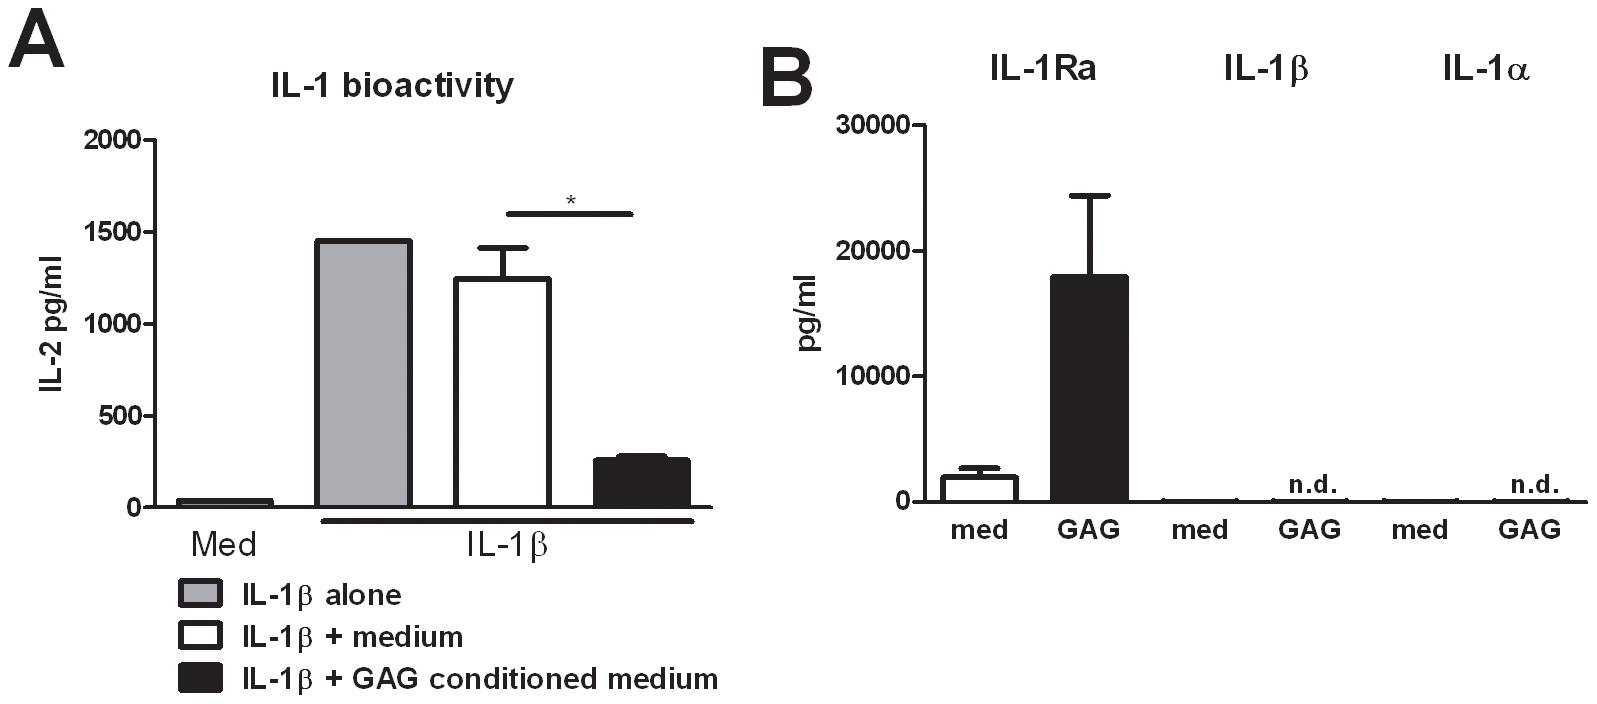 GAG induces interleukin 1 receptor antagonist.